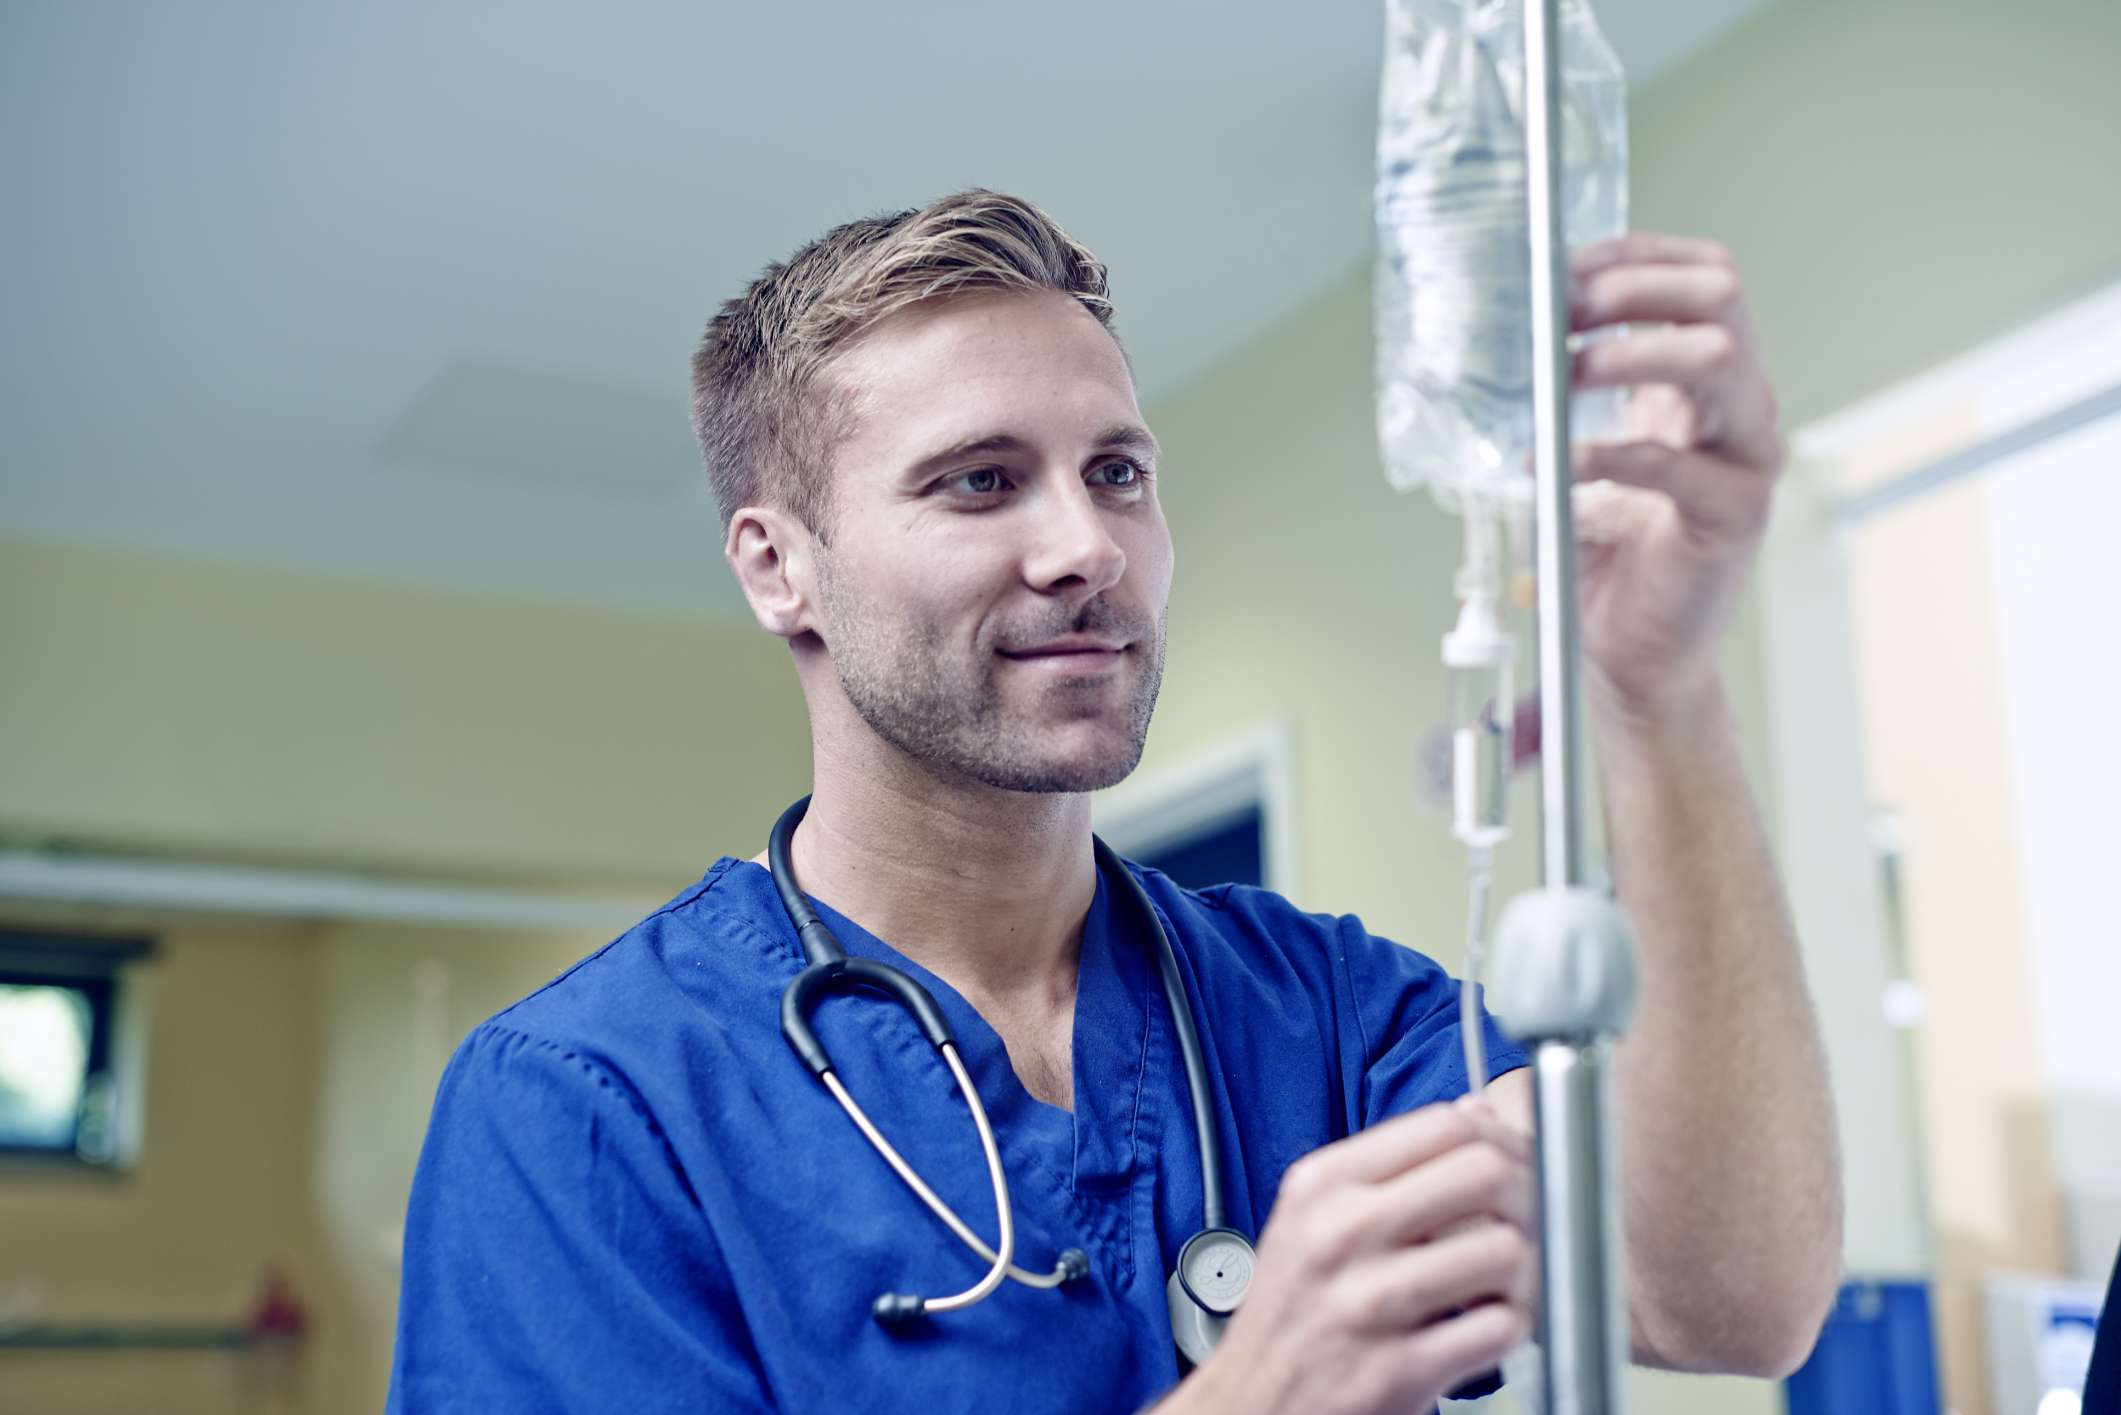 Nurse setting up an IV bag